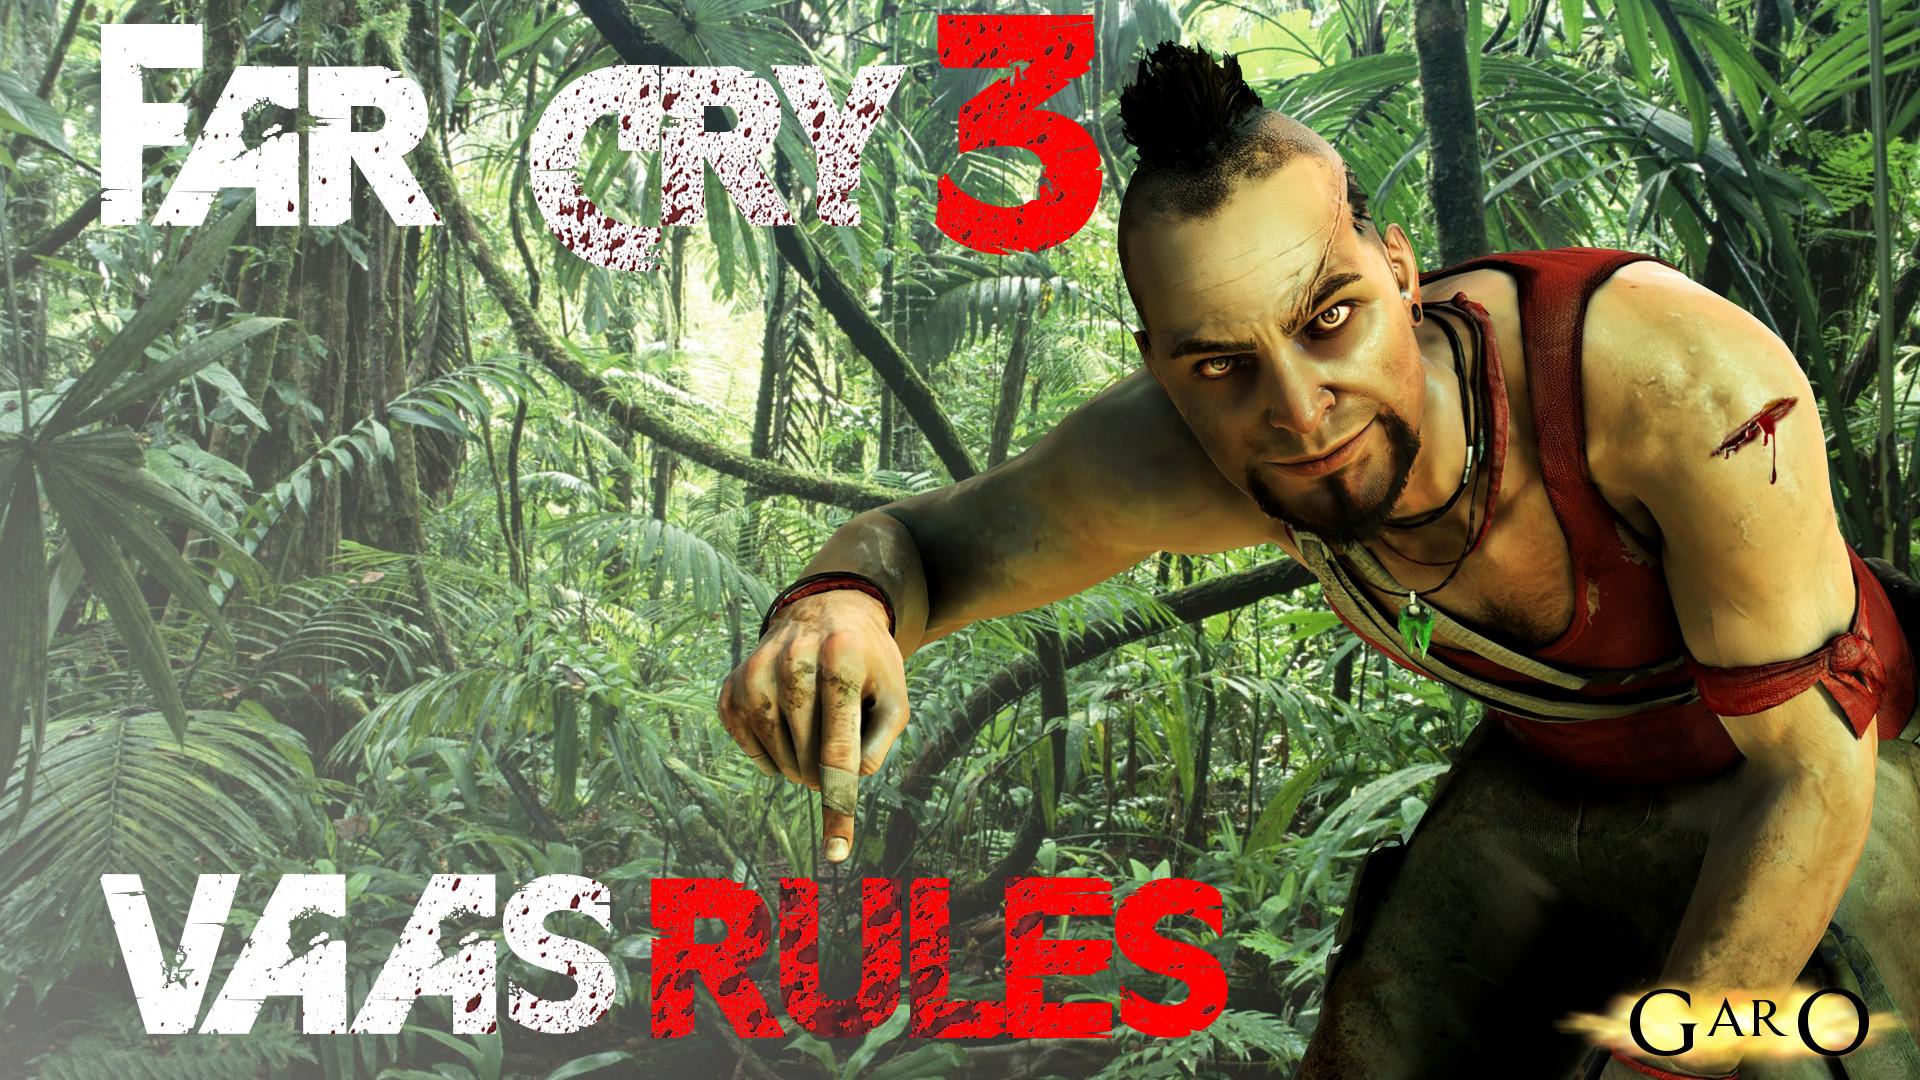 … Far Cry 3 Wallpaper | Vaas rules by GaroArts